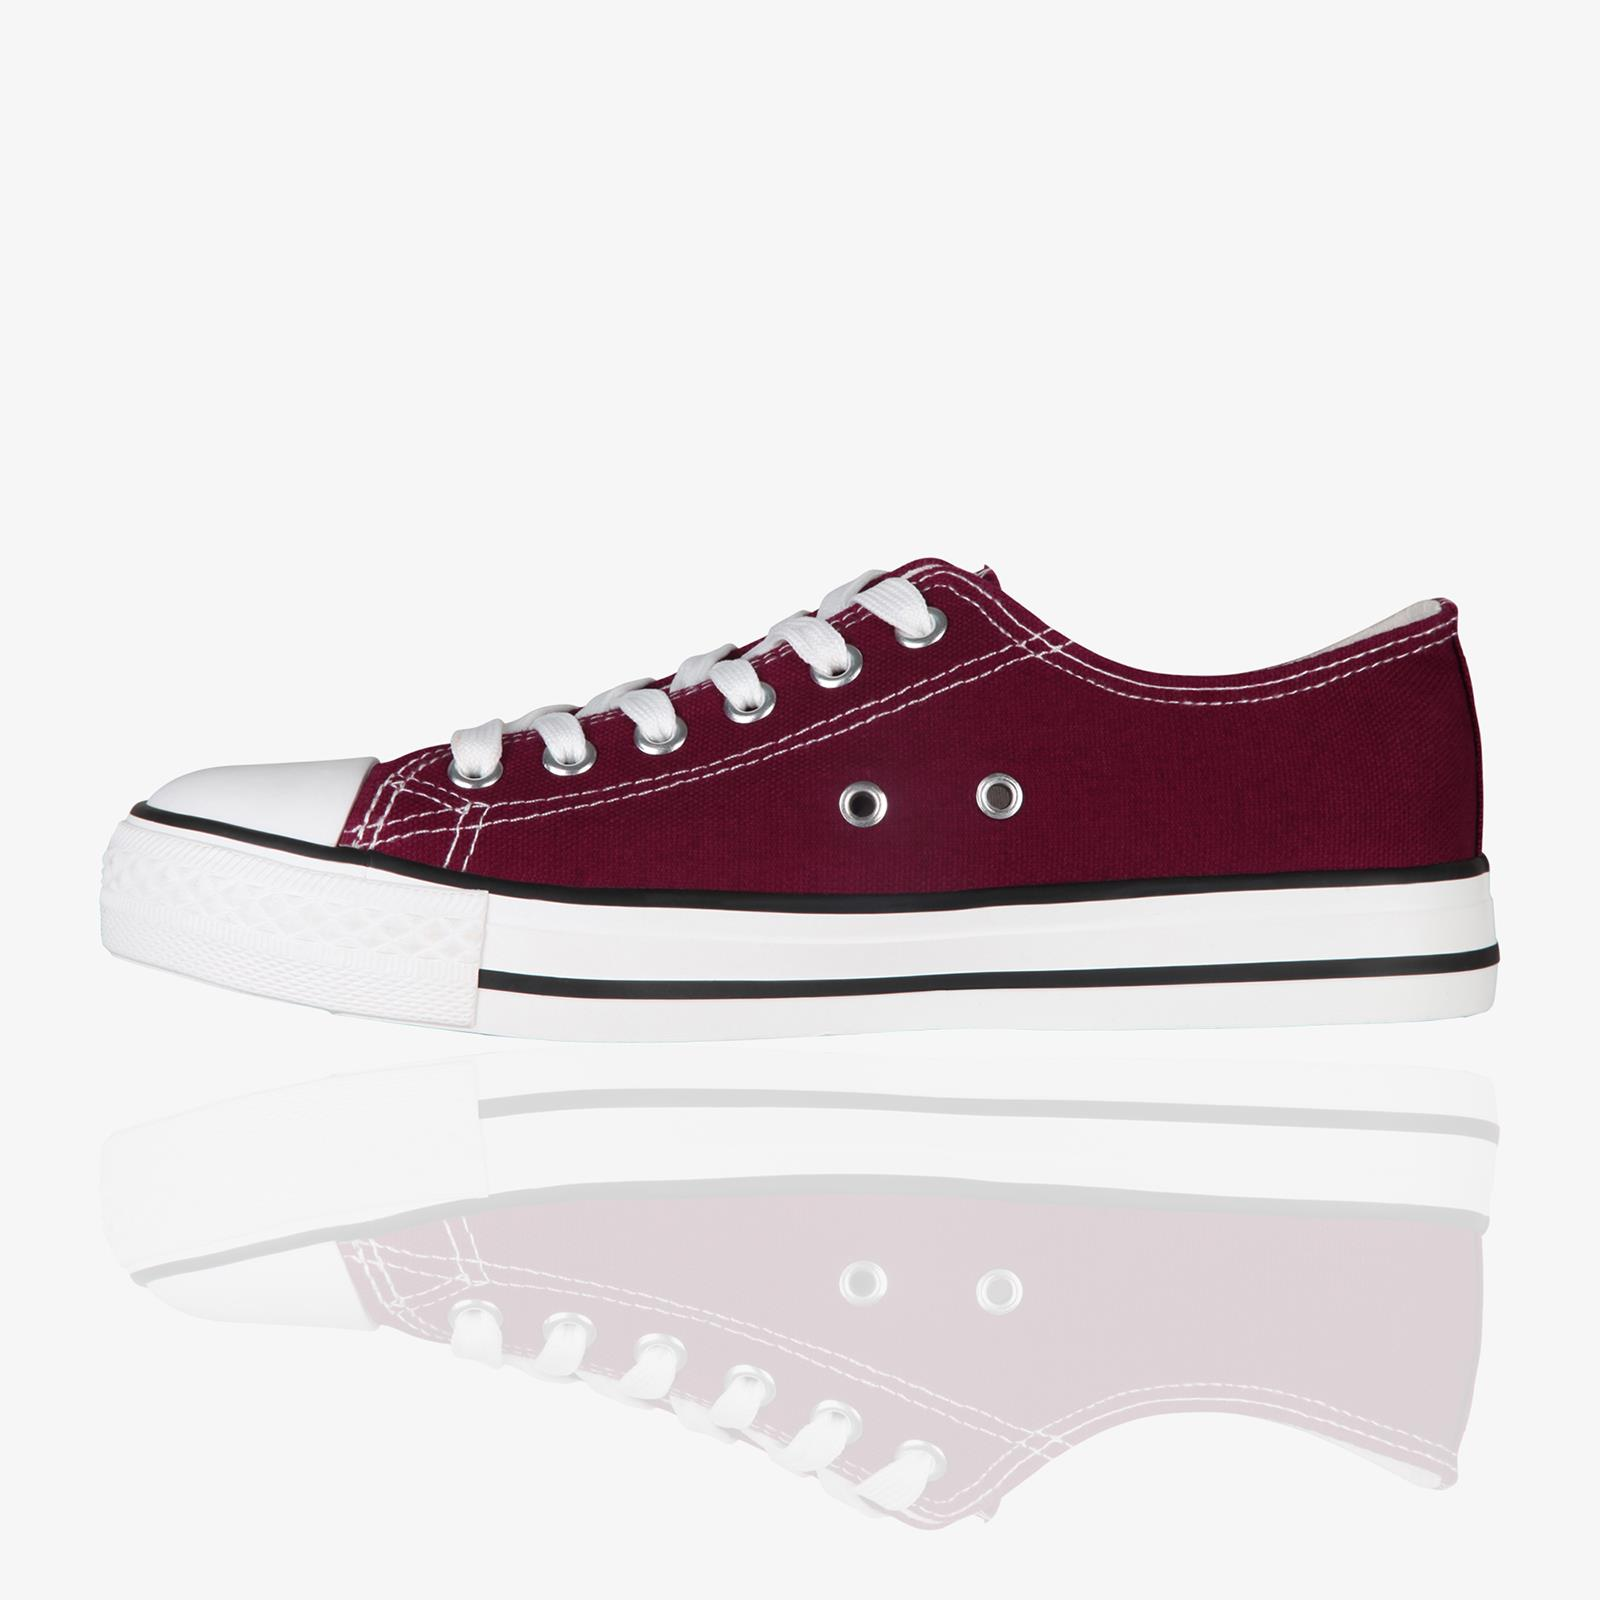 Zapatillas-Mujer-Casuales-Deportiva-Barata-Lona-Moda-Originales-Outlet-Tela-Moda miniatura 16